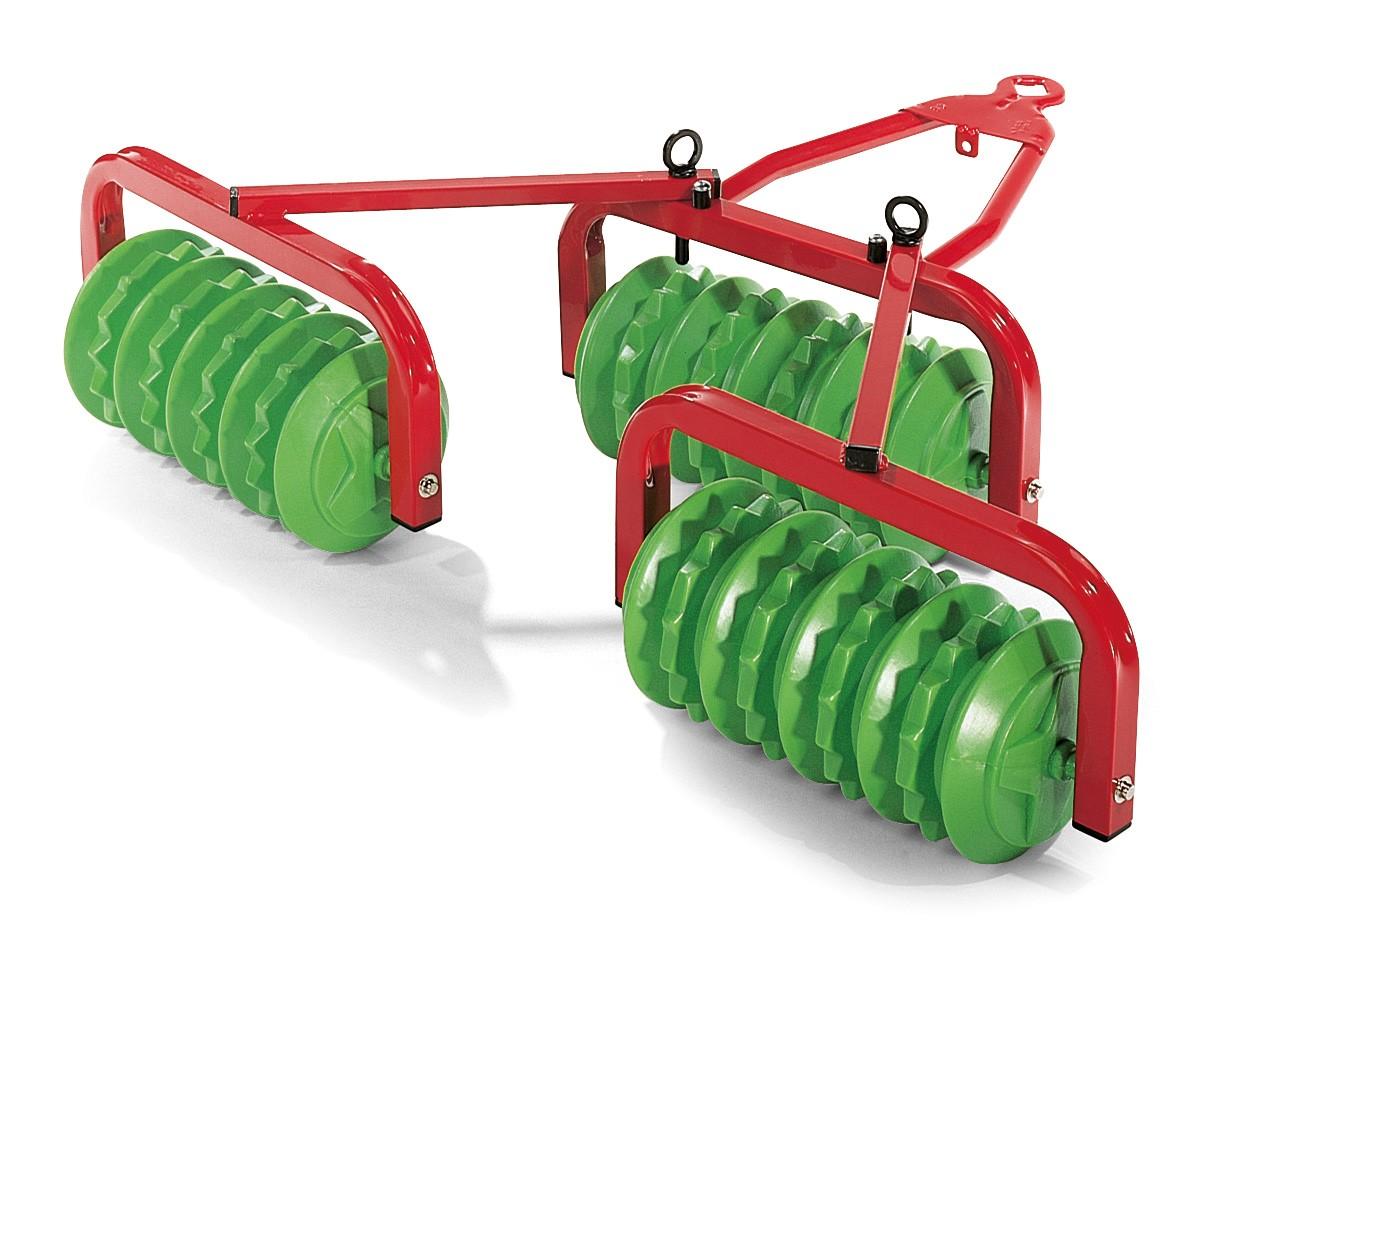 Cambridge Walze für Tretfahrzeuge - Rolly Toys Bild 1